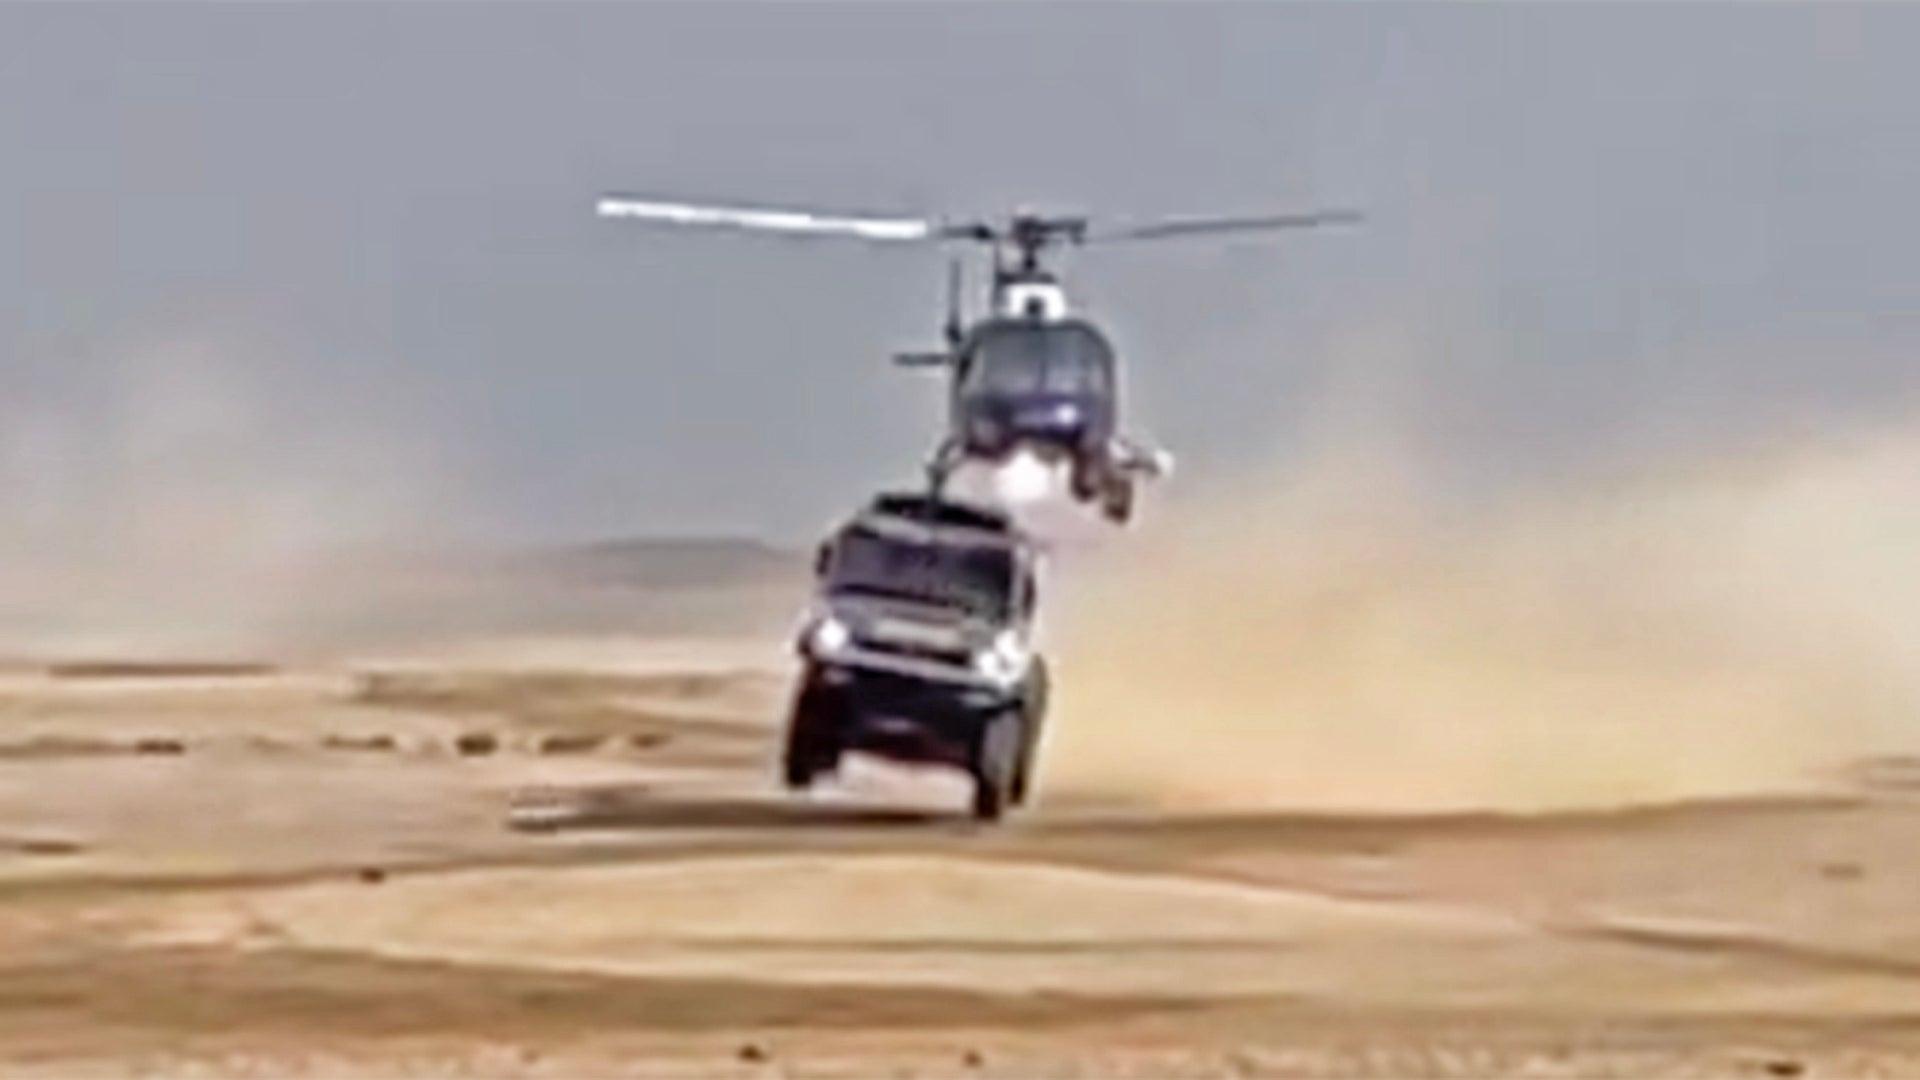 dakar truck helicopter crash hero jpg?quality=85.